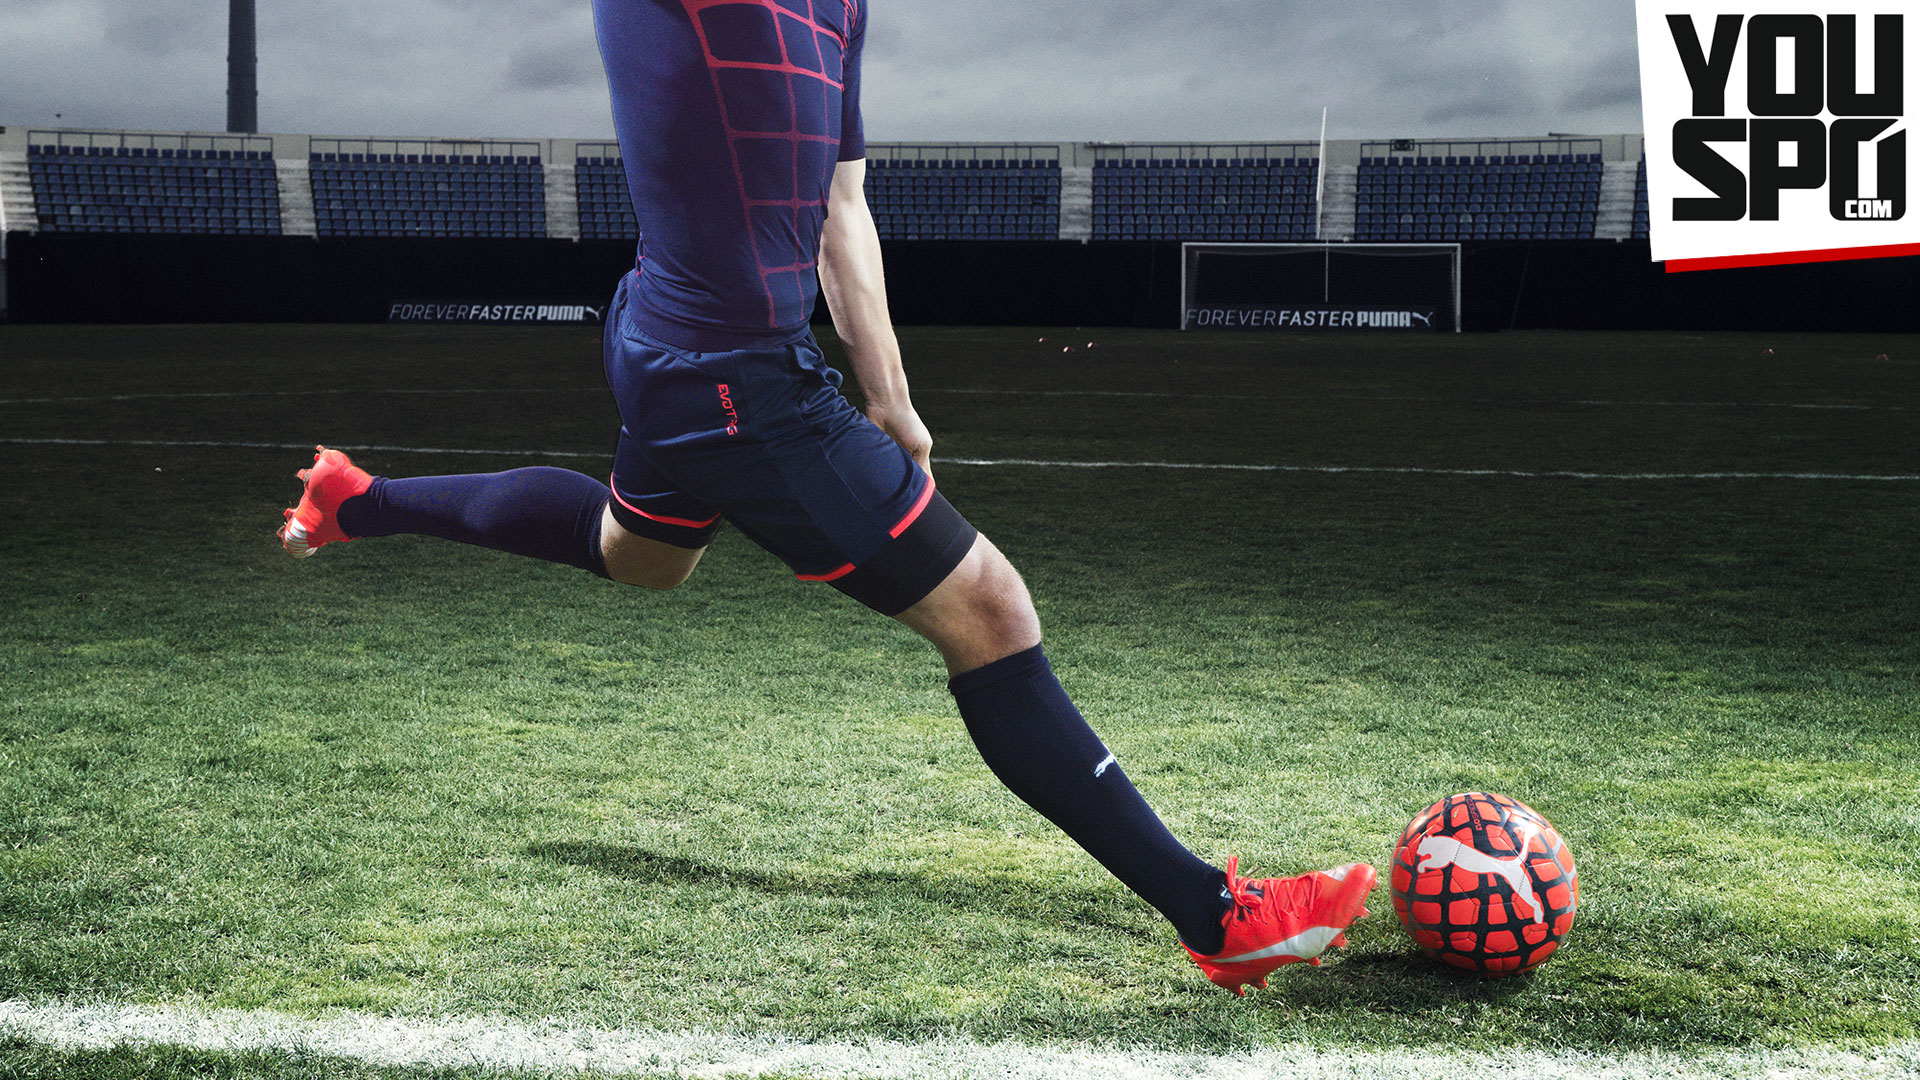 Puma evoSpeed SL FG Marco Reus